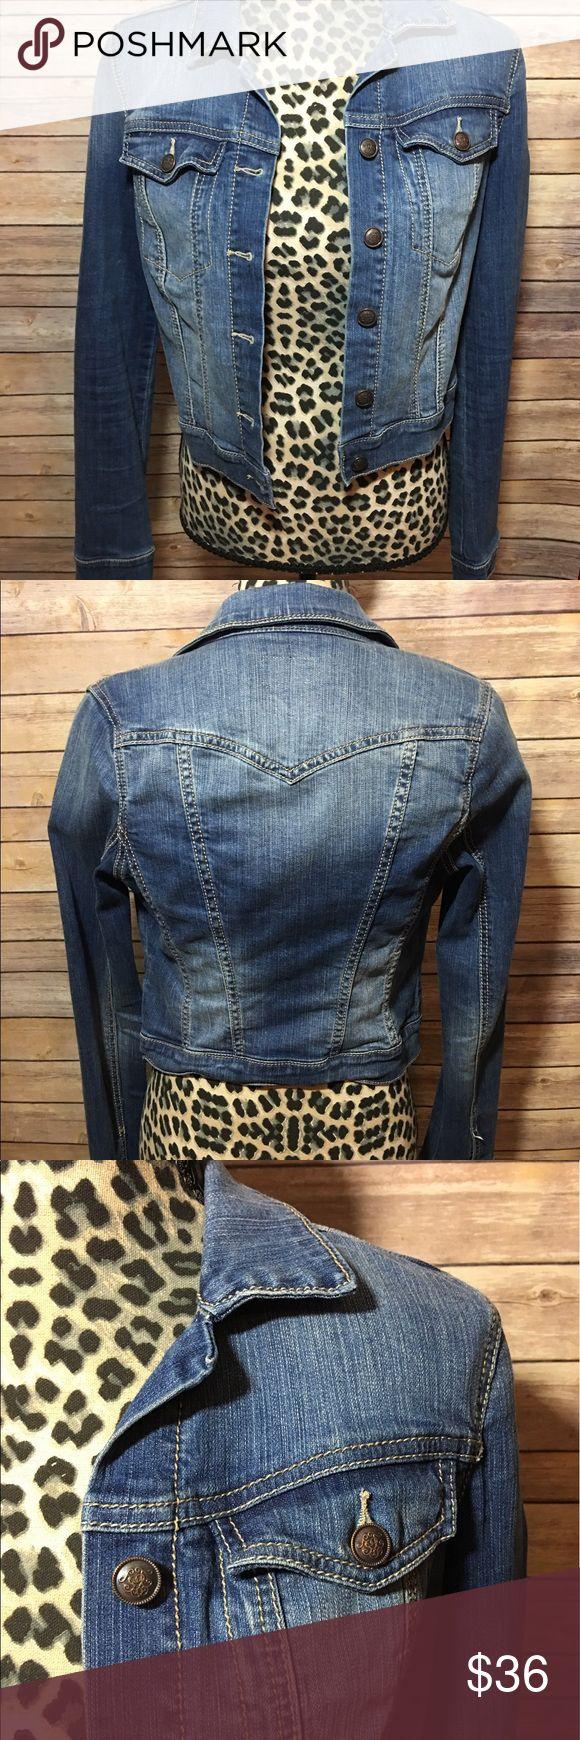 Jessica Simpson Blue Jean Jacket Sz S Women's Half Medium Wash Cotton Spandex Jacket Jessica Simpson Jackets & Coats Jean Jackets